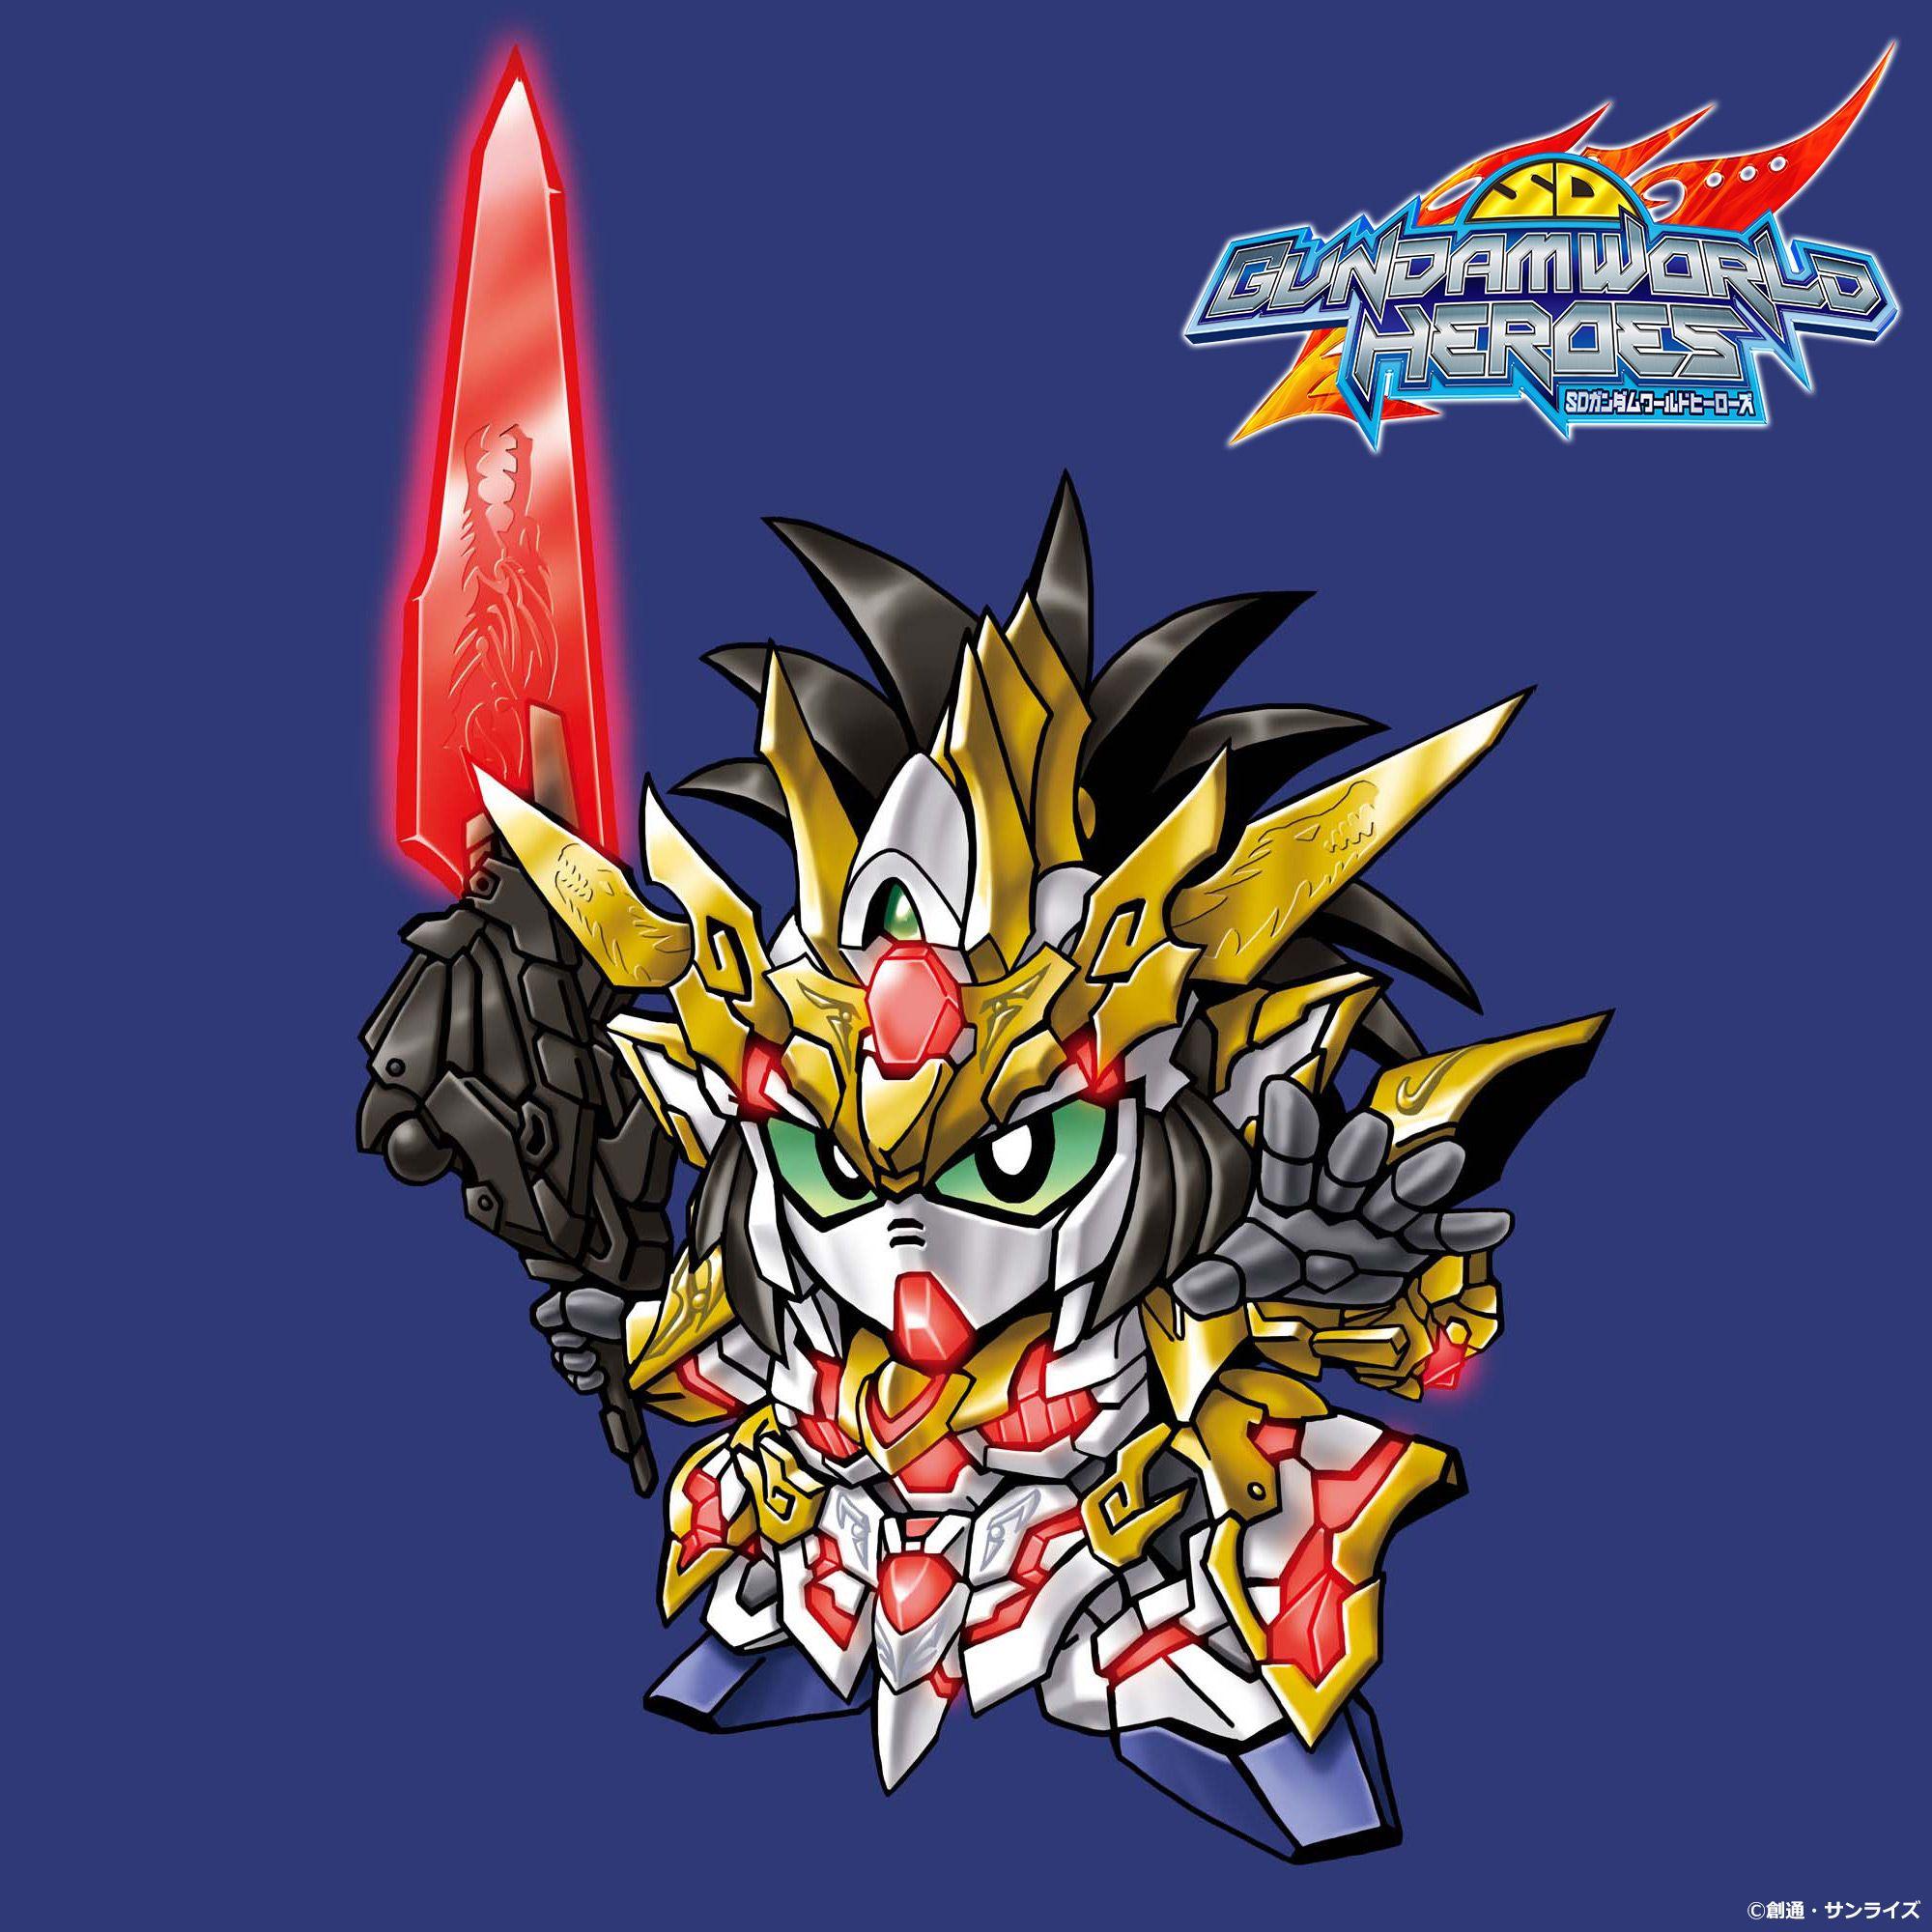 SD Gundam World Heroes Episode 23 Release Date, Recap, And Spoilers